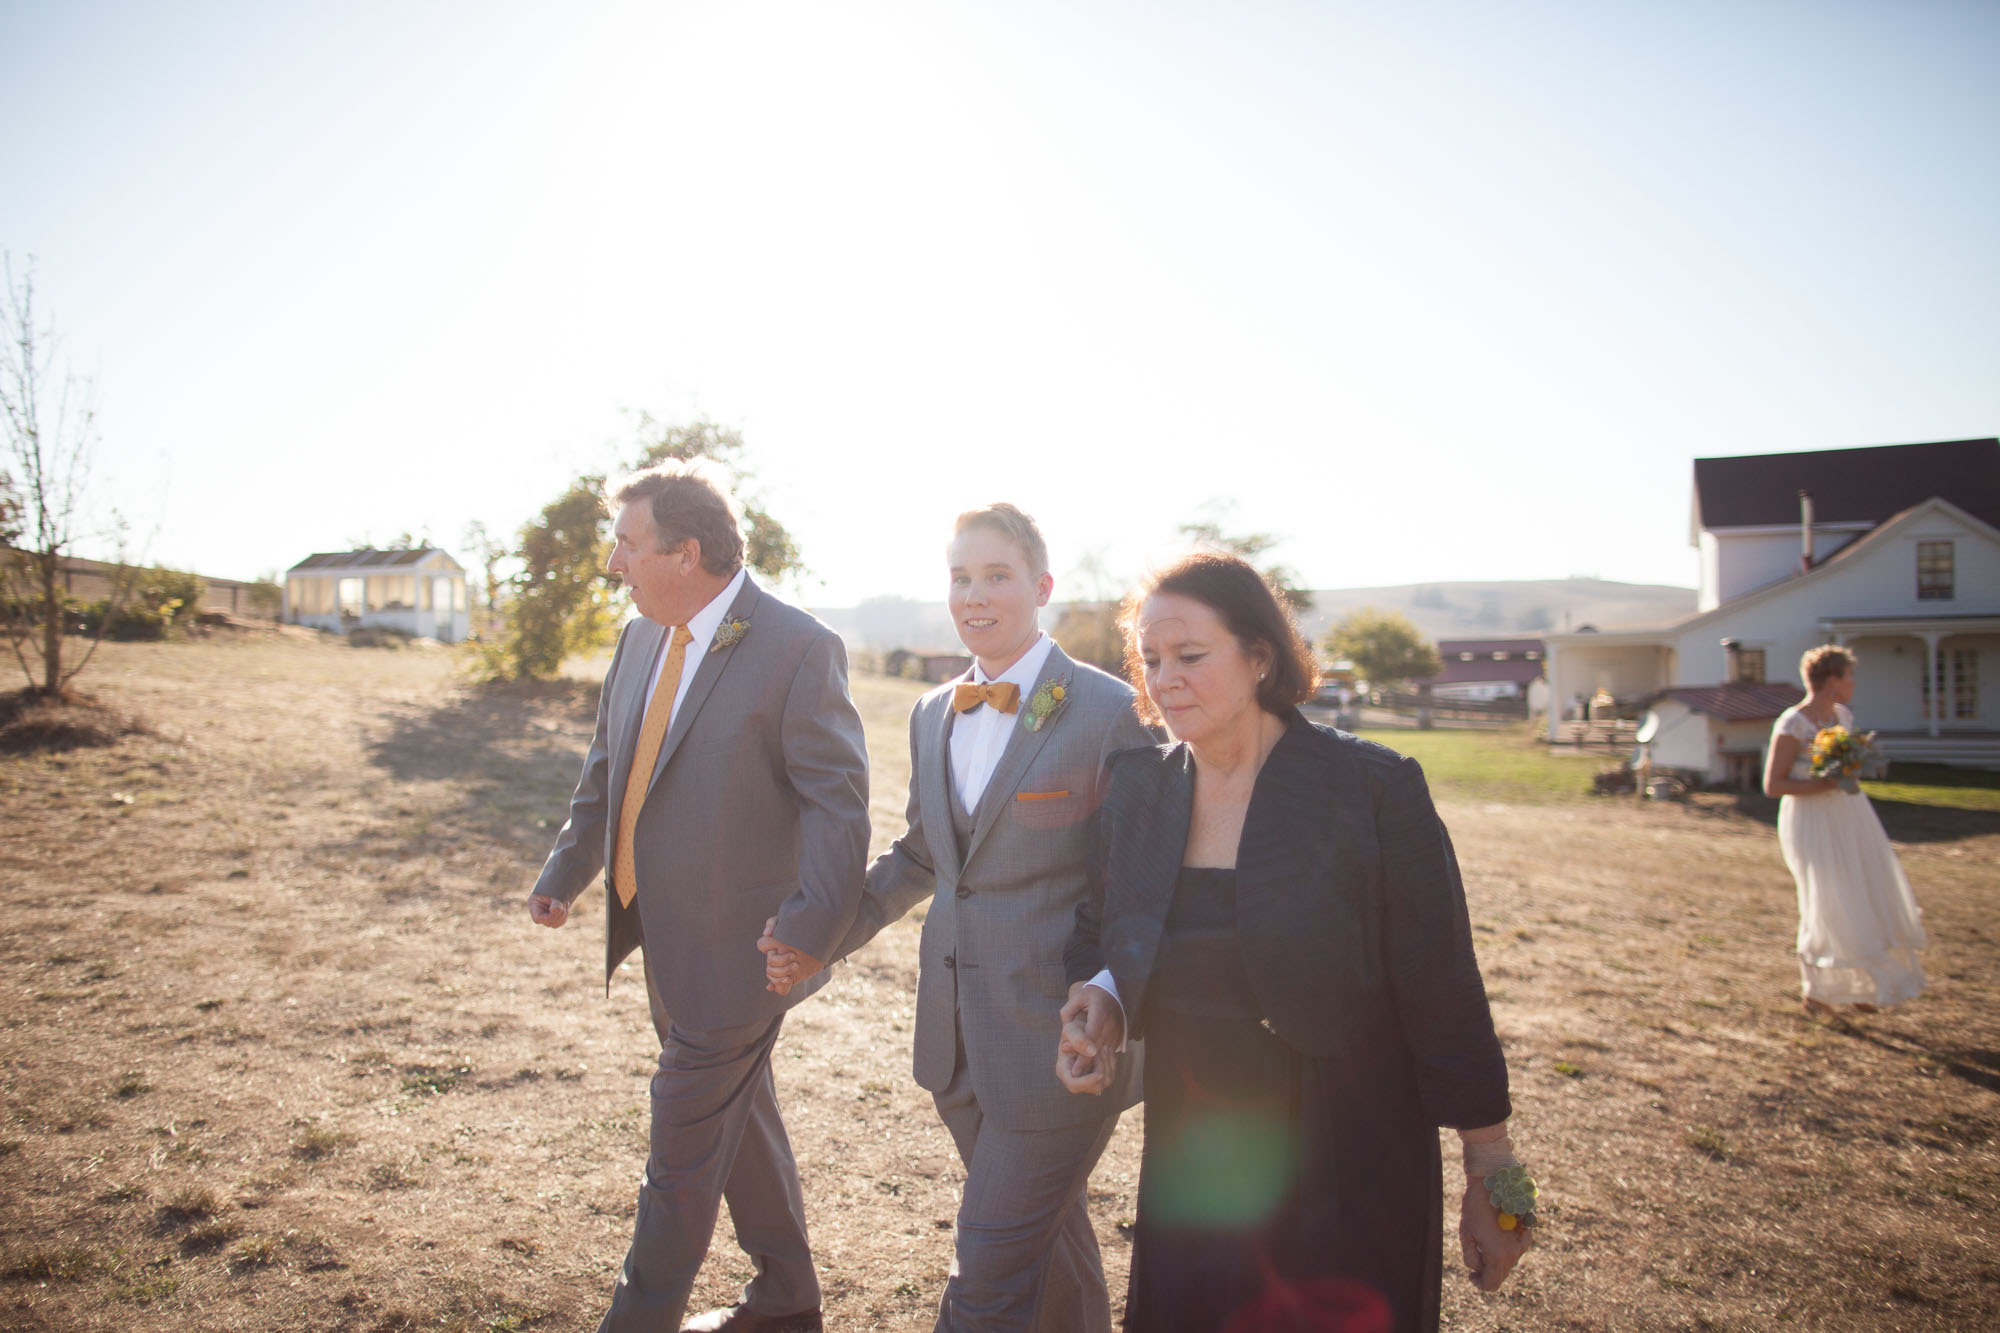 Gretchen_Gause_Petaluma_Olympias_Valley_Wedding_Photo-155.jpg